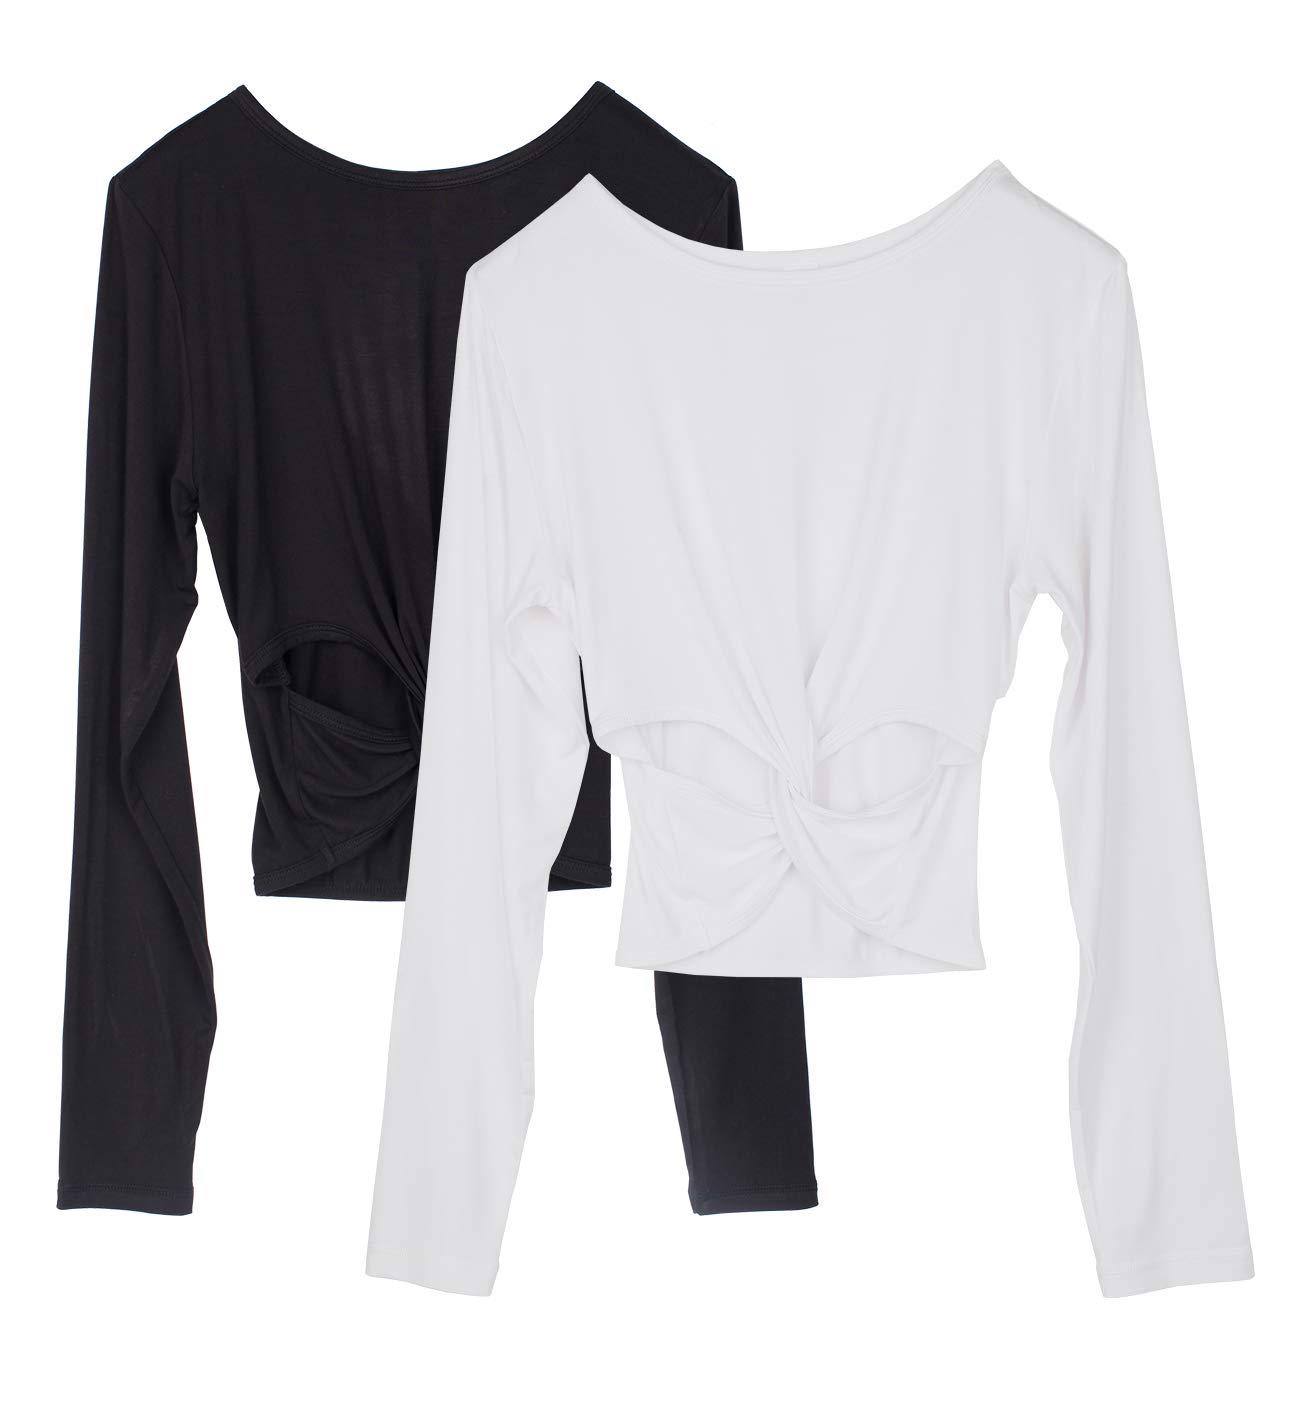 Icyzone Long Sleeve Crop Tops For Women Activewear Workout Yoga